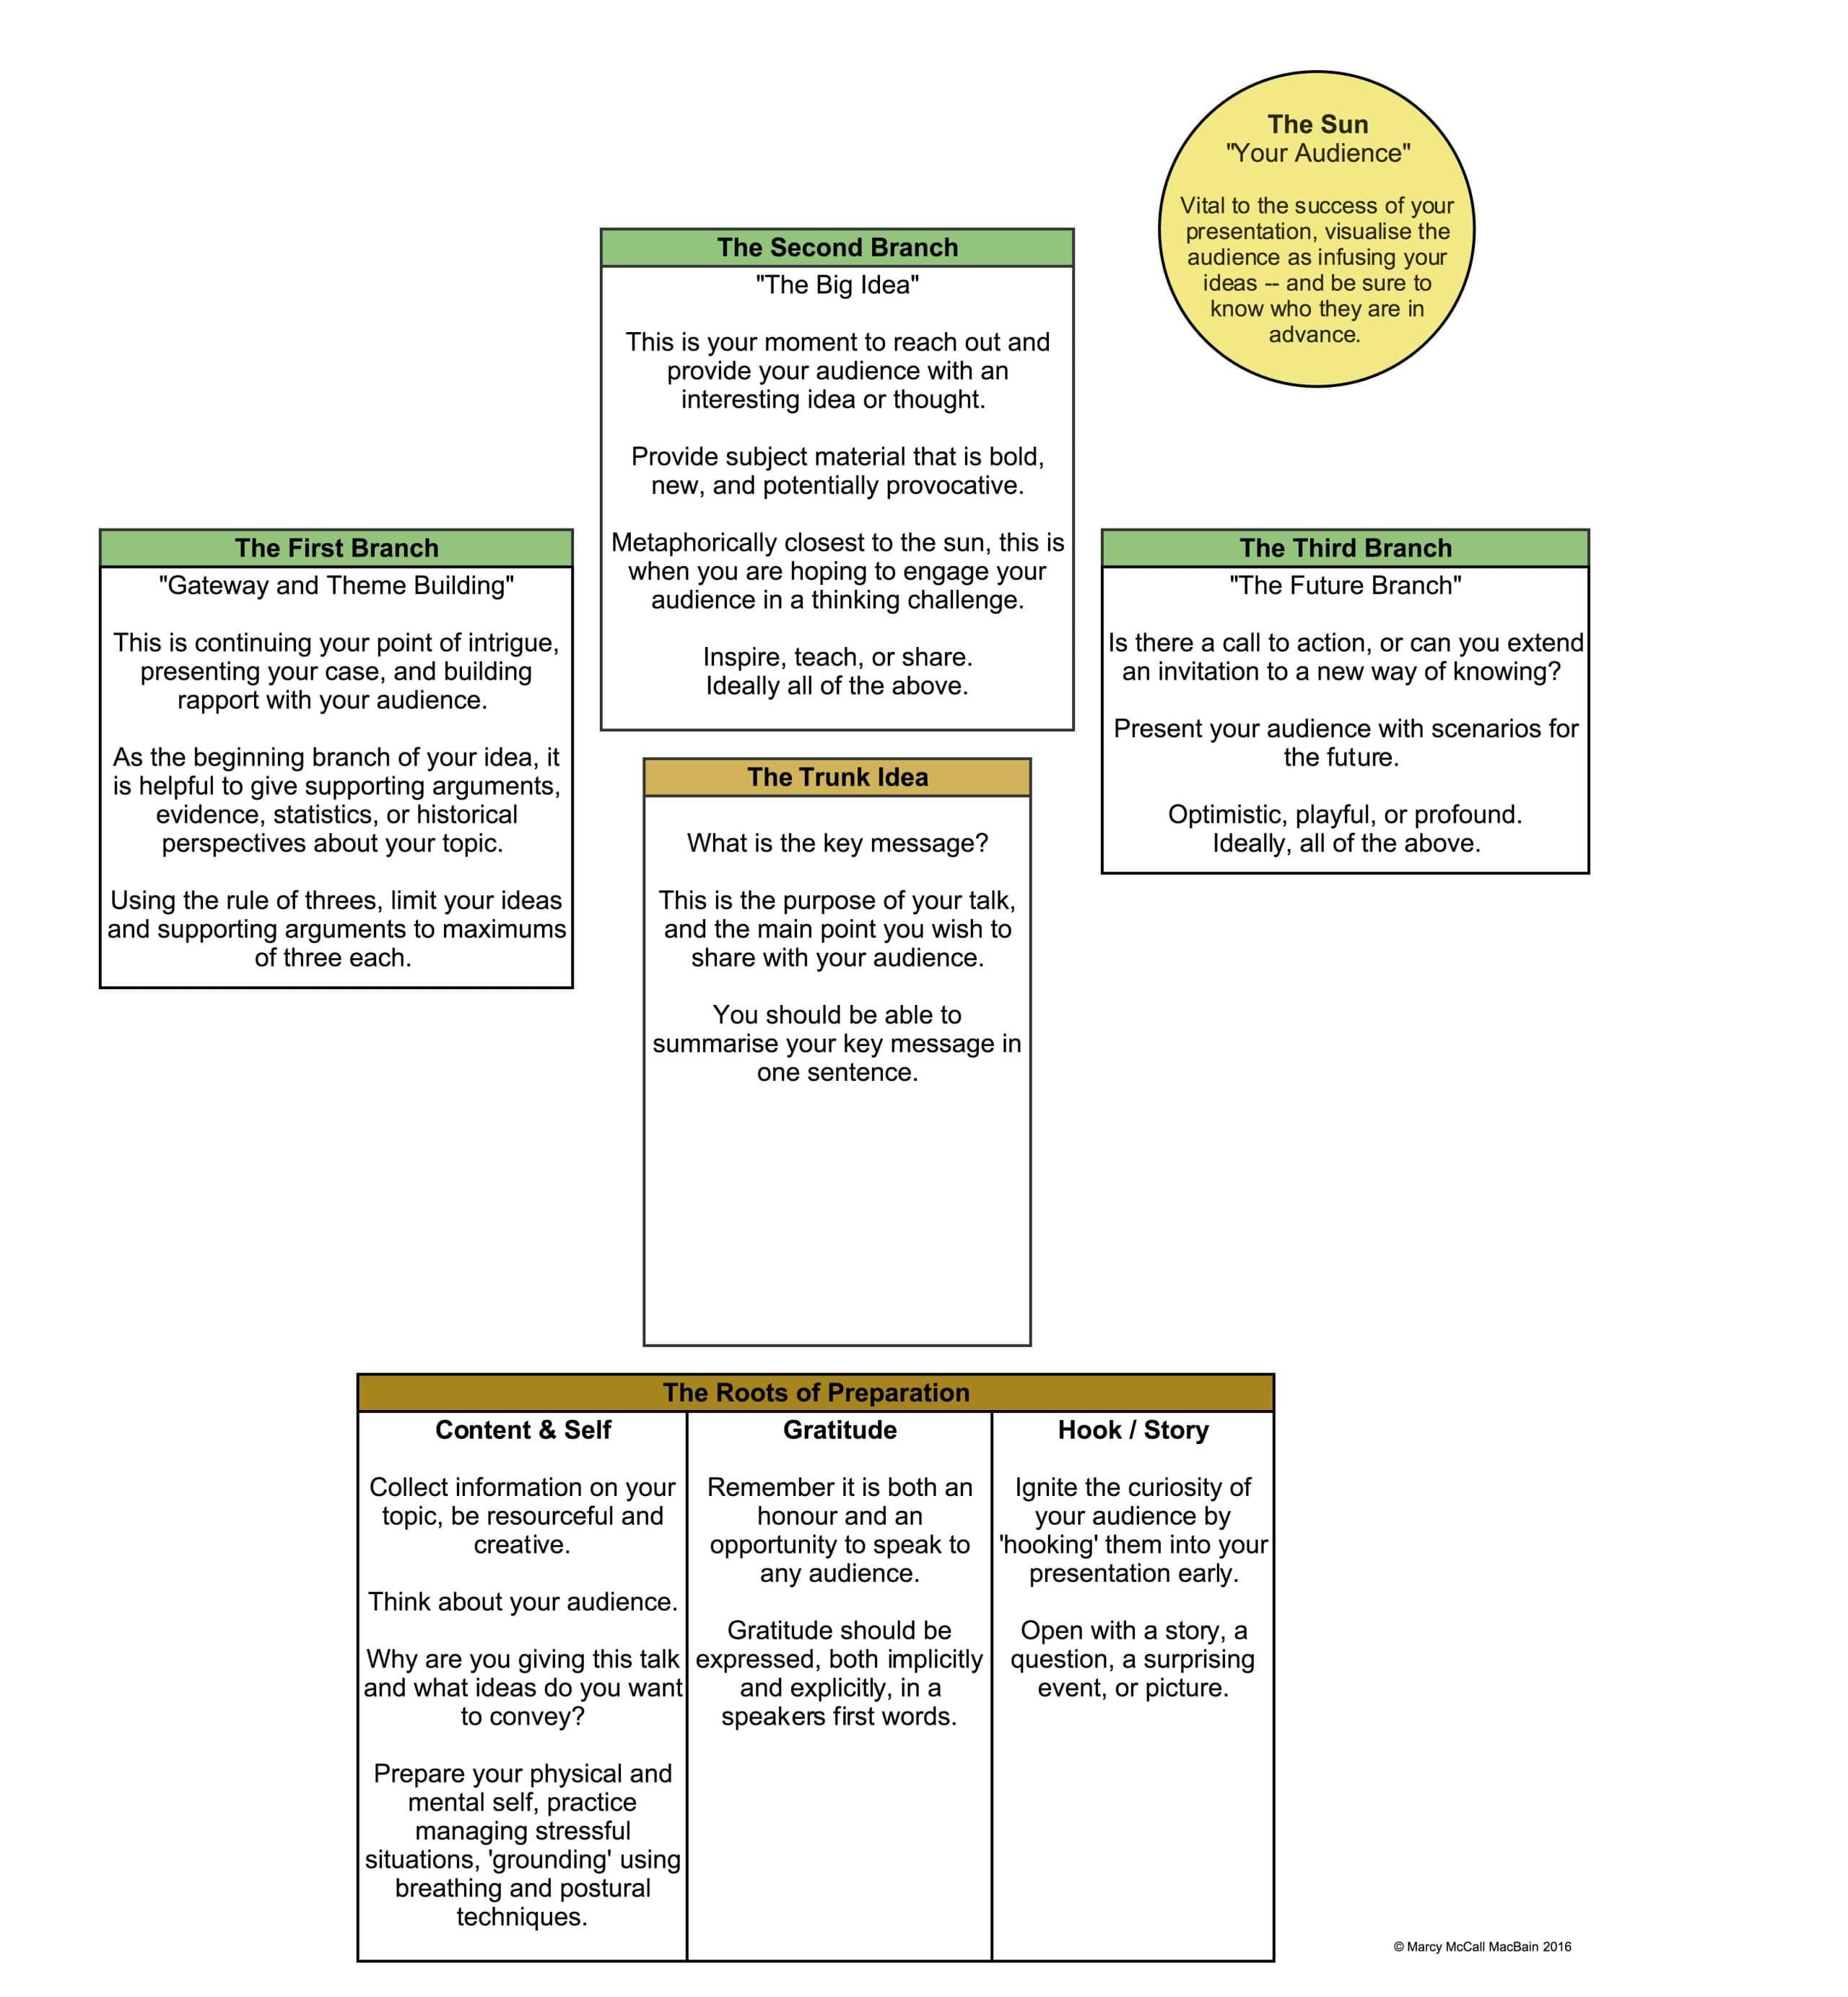 treetalkparadigm-2